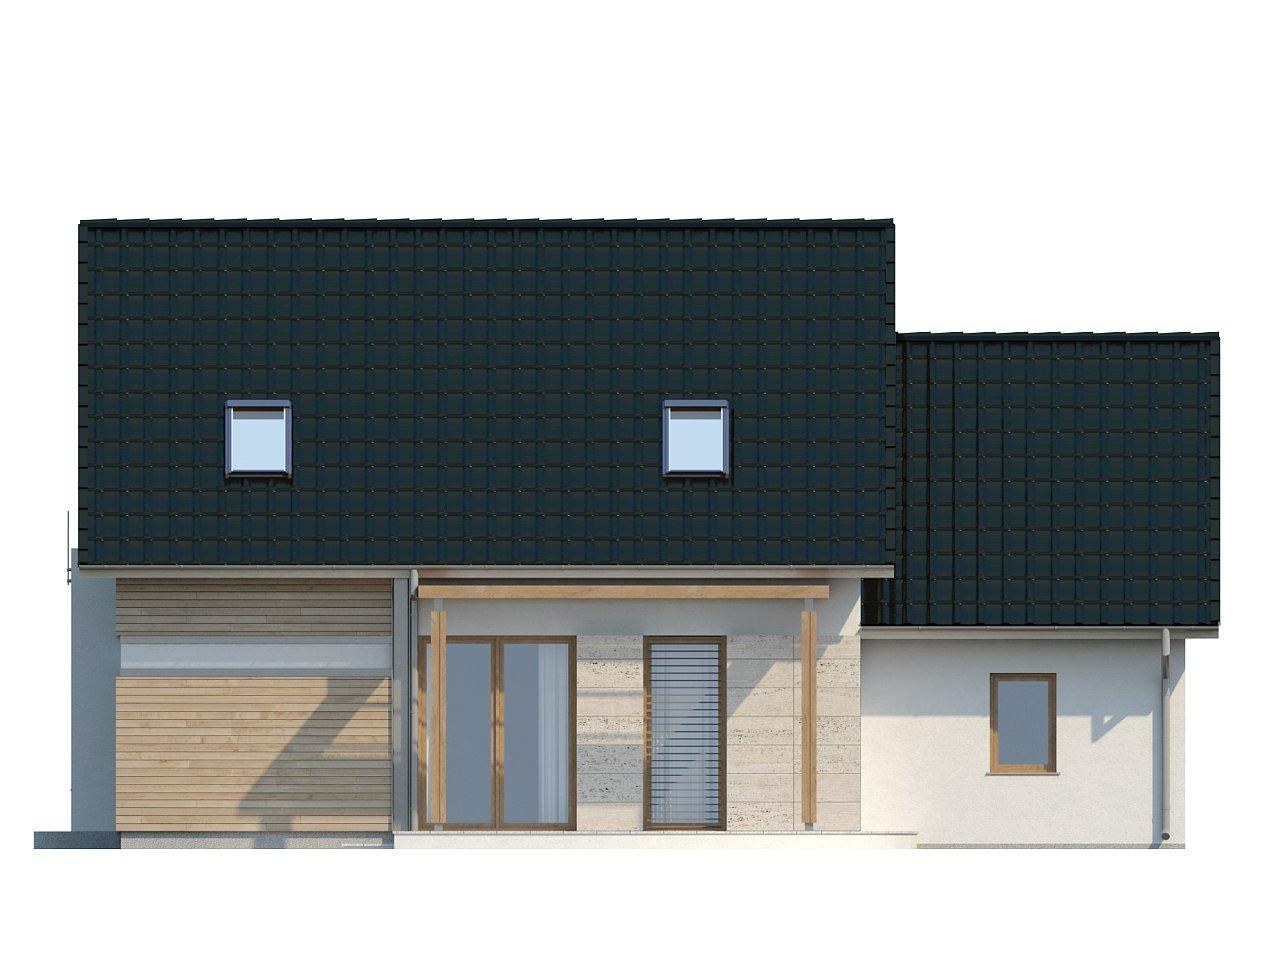 Проект практичного дома с эркером и гаражом на одну машину. 23